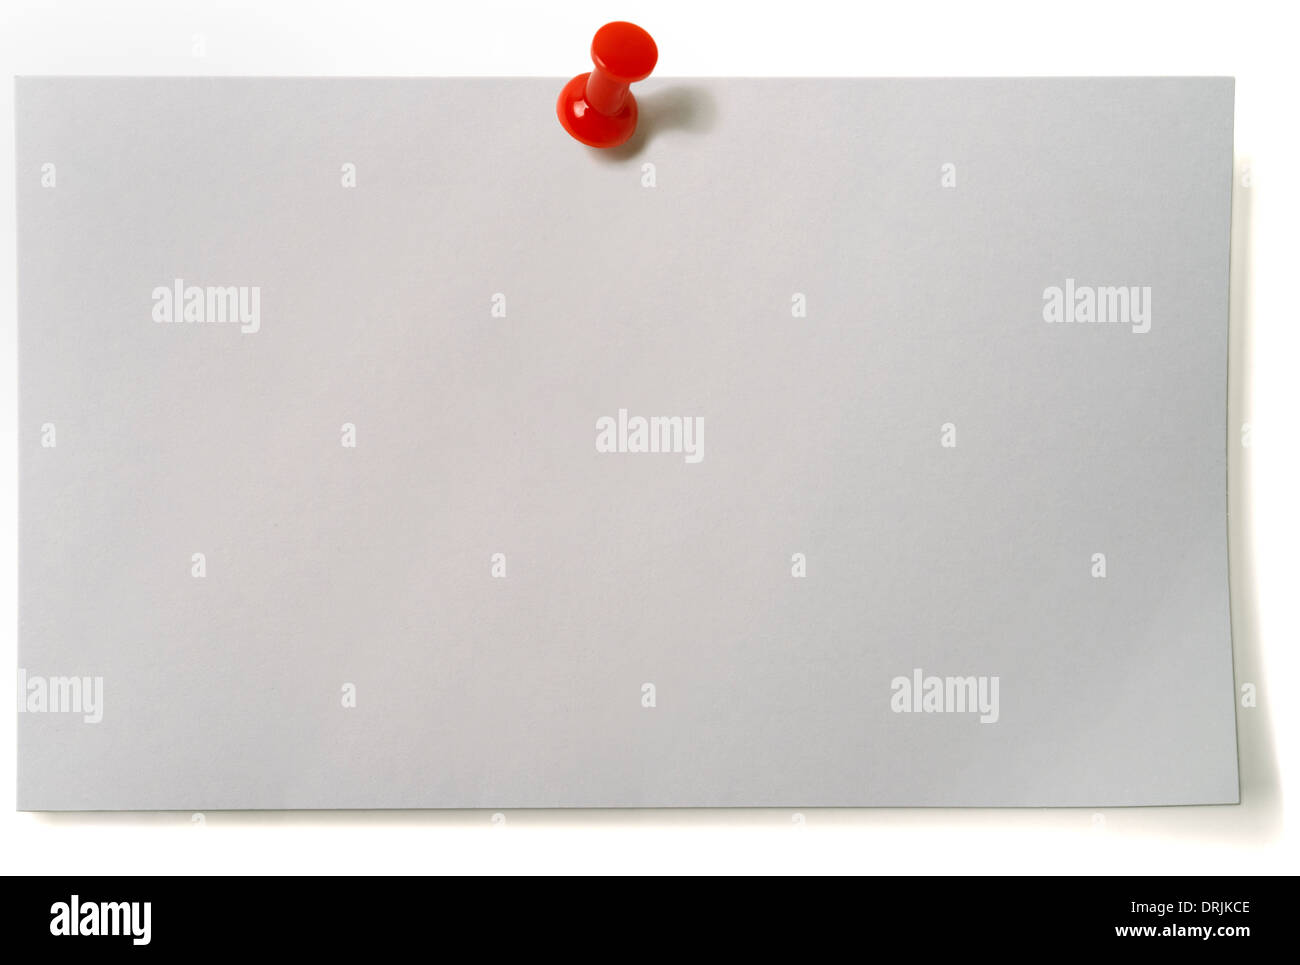 index card stock photo 66178574 alamy